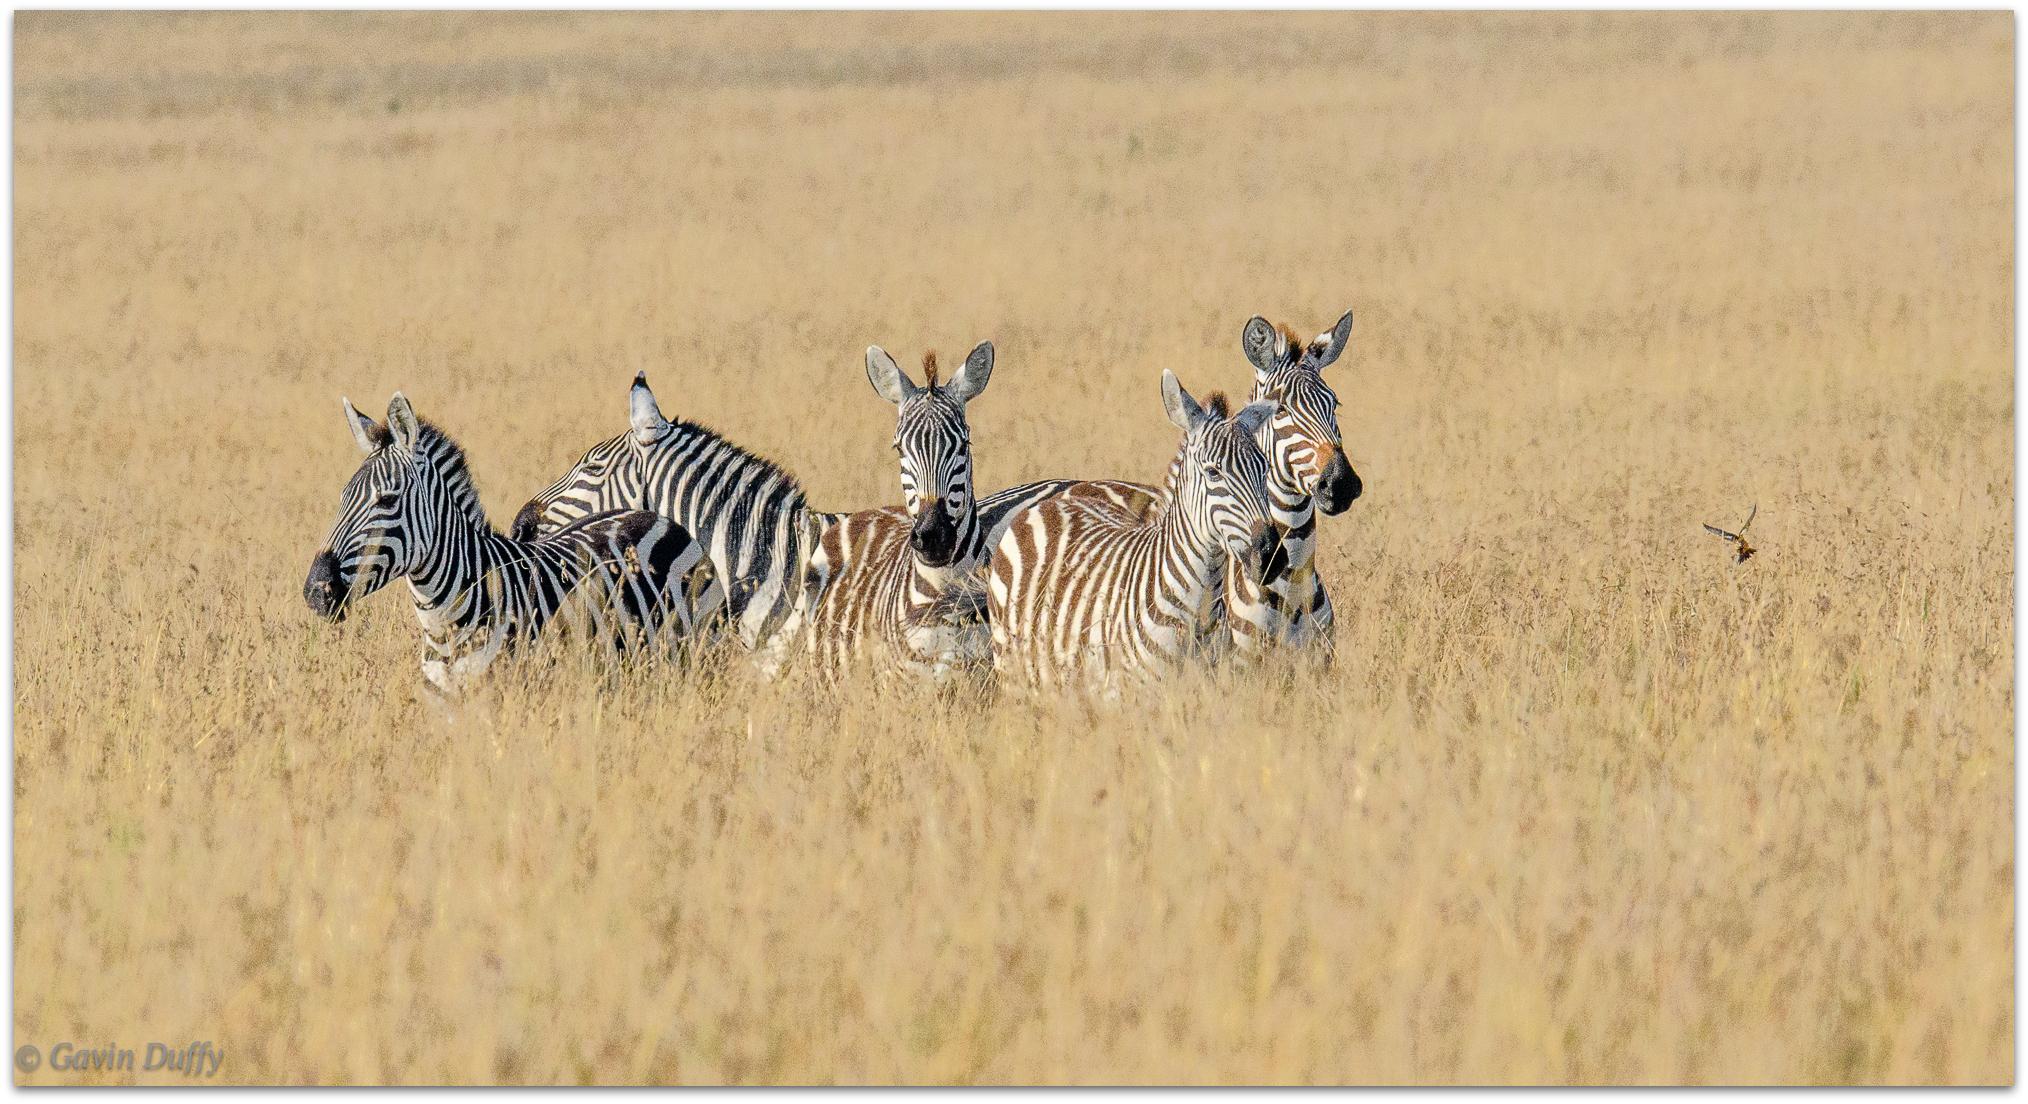 Zebra startled by a bird © Gavin Duffy